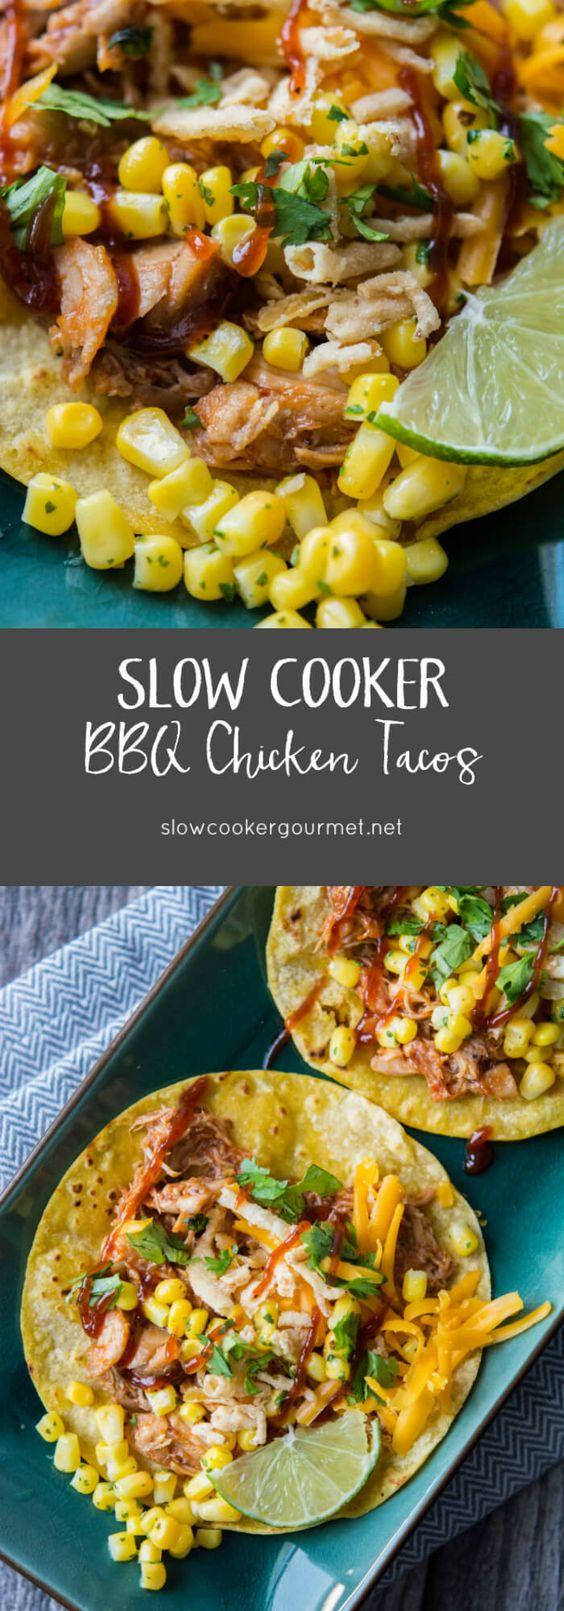 or other bottles chicken seasoning blend Slow Cooker BBQ Chicken Tacos